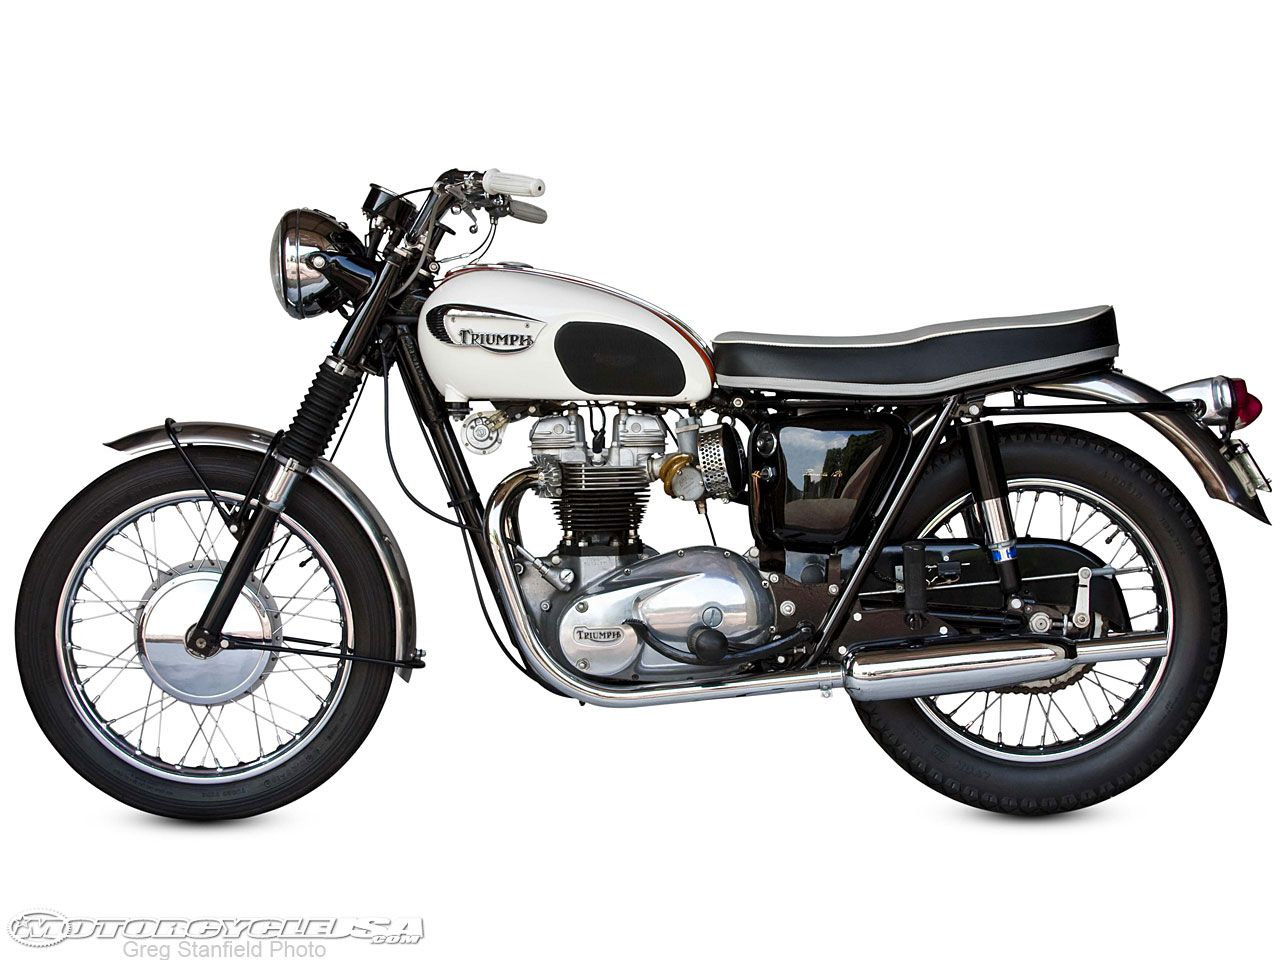 Vintage Motorcycles Vintage Motorcycles At Kentucky Arts Museum - Best car museums in us